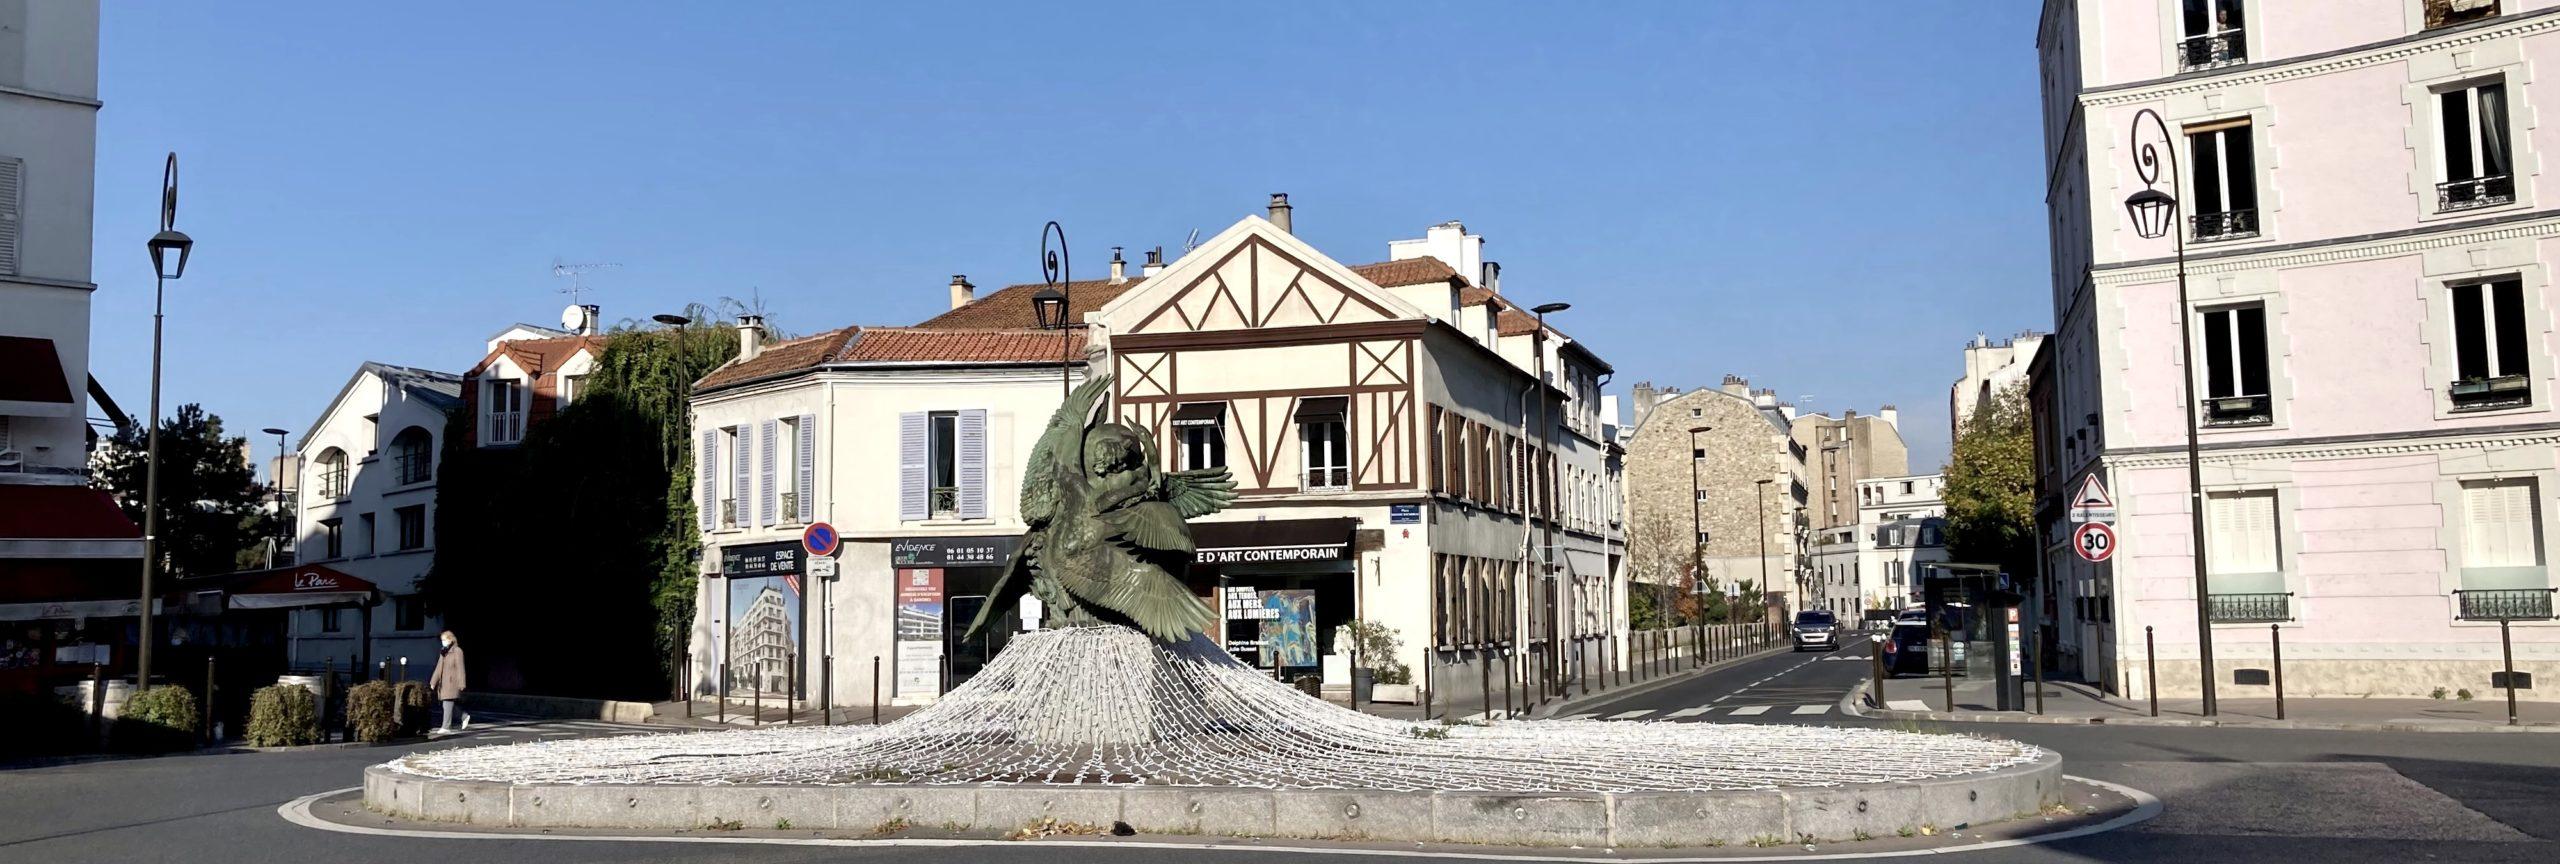 Chasseur immobilier Boulogne Billancourt